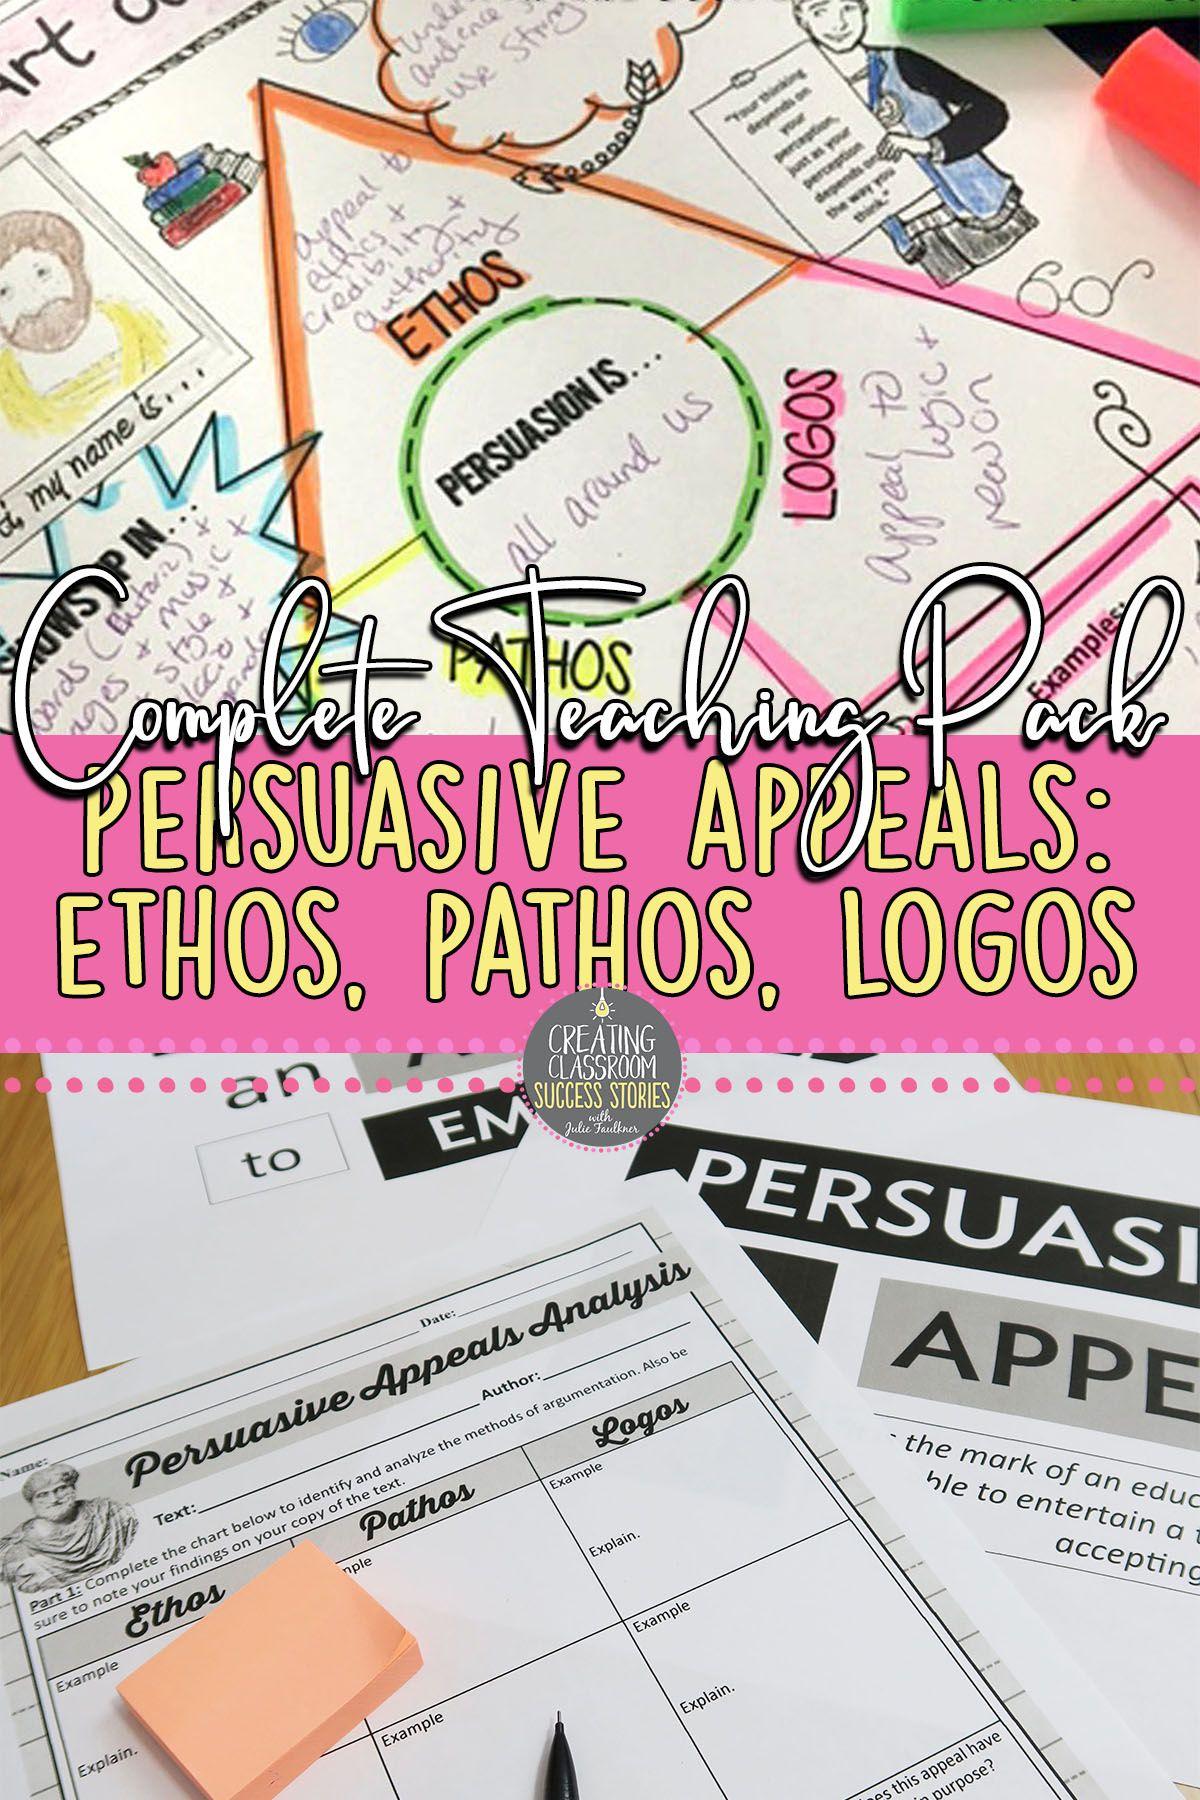 Ethos Pathos Logos Persuasive Rhetorical Appeals